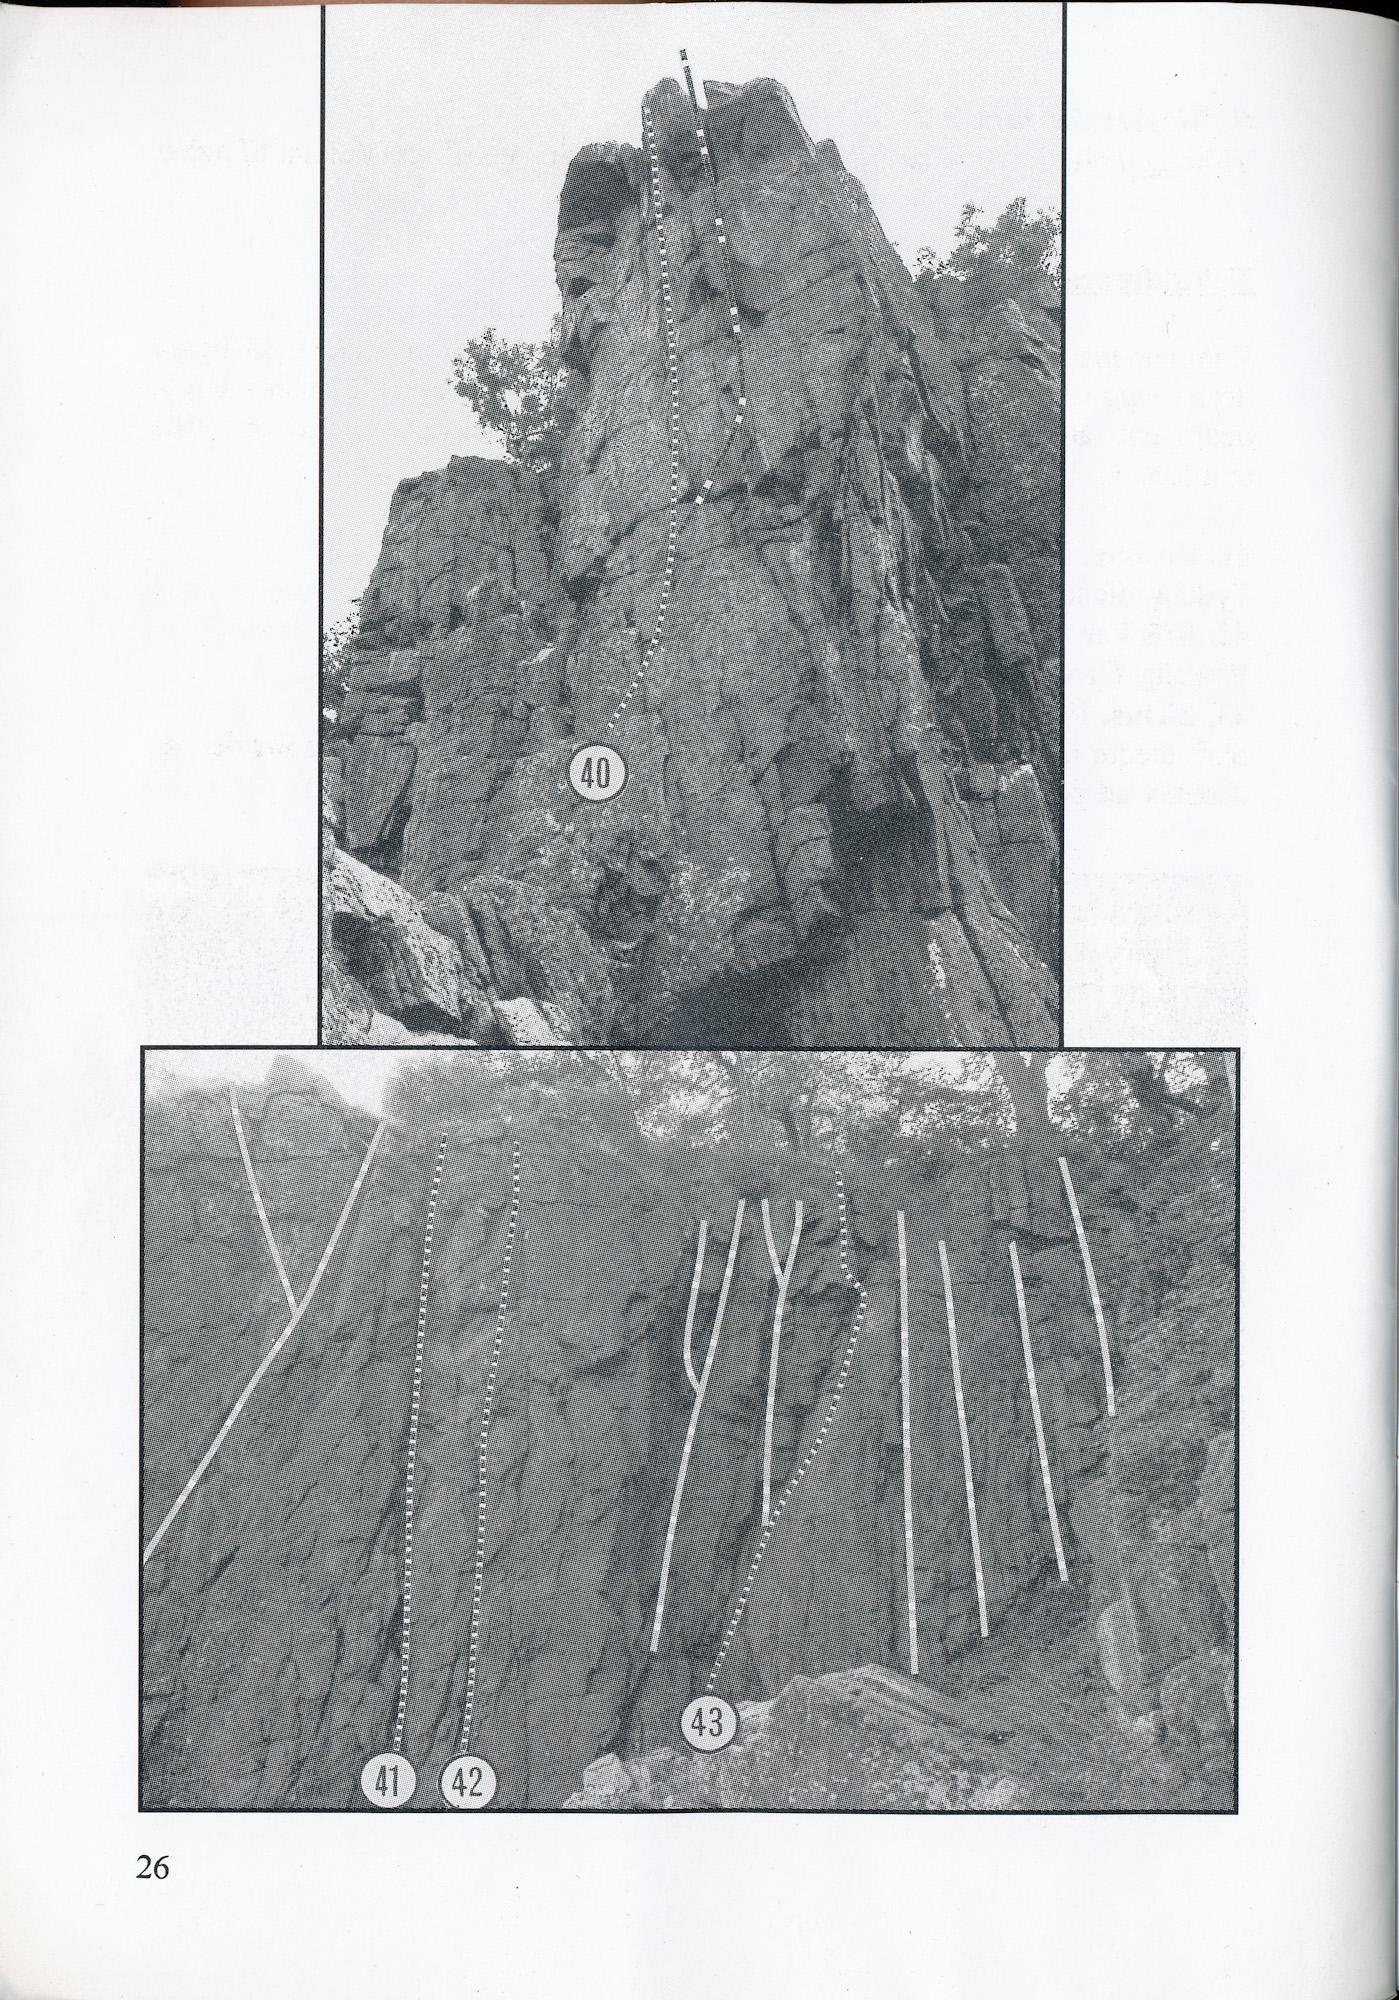 50 udvalgte ruter paa bornholm 1995 26.jpg